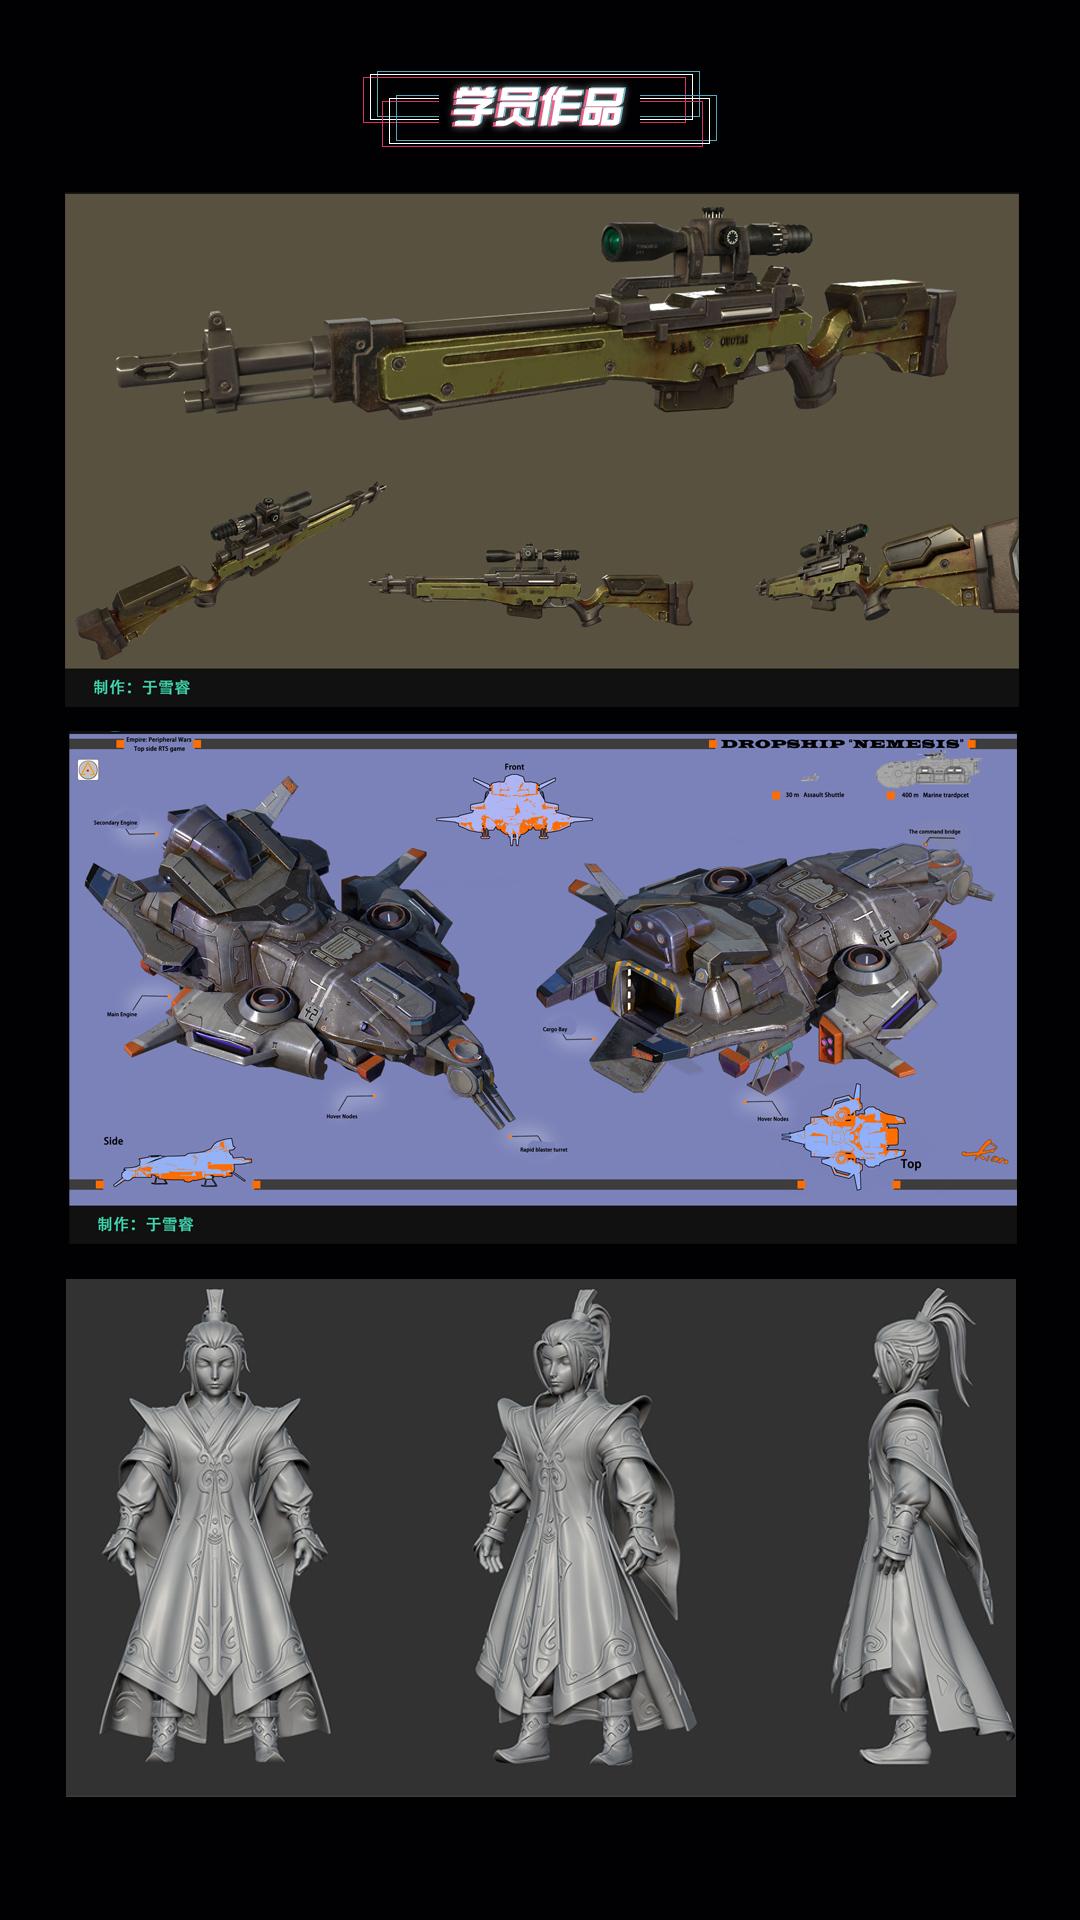 3dmax次世代游戏手雷道具建模教程